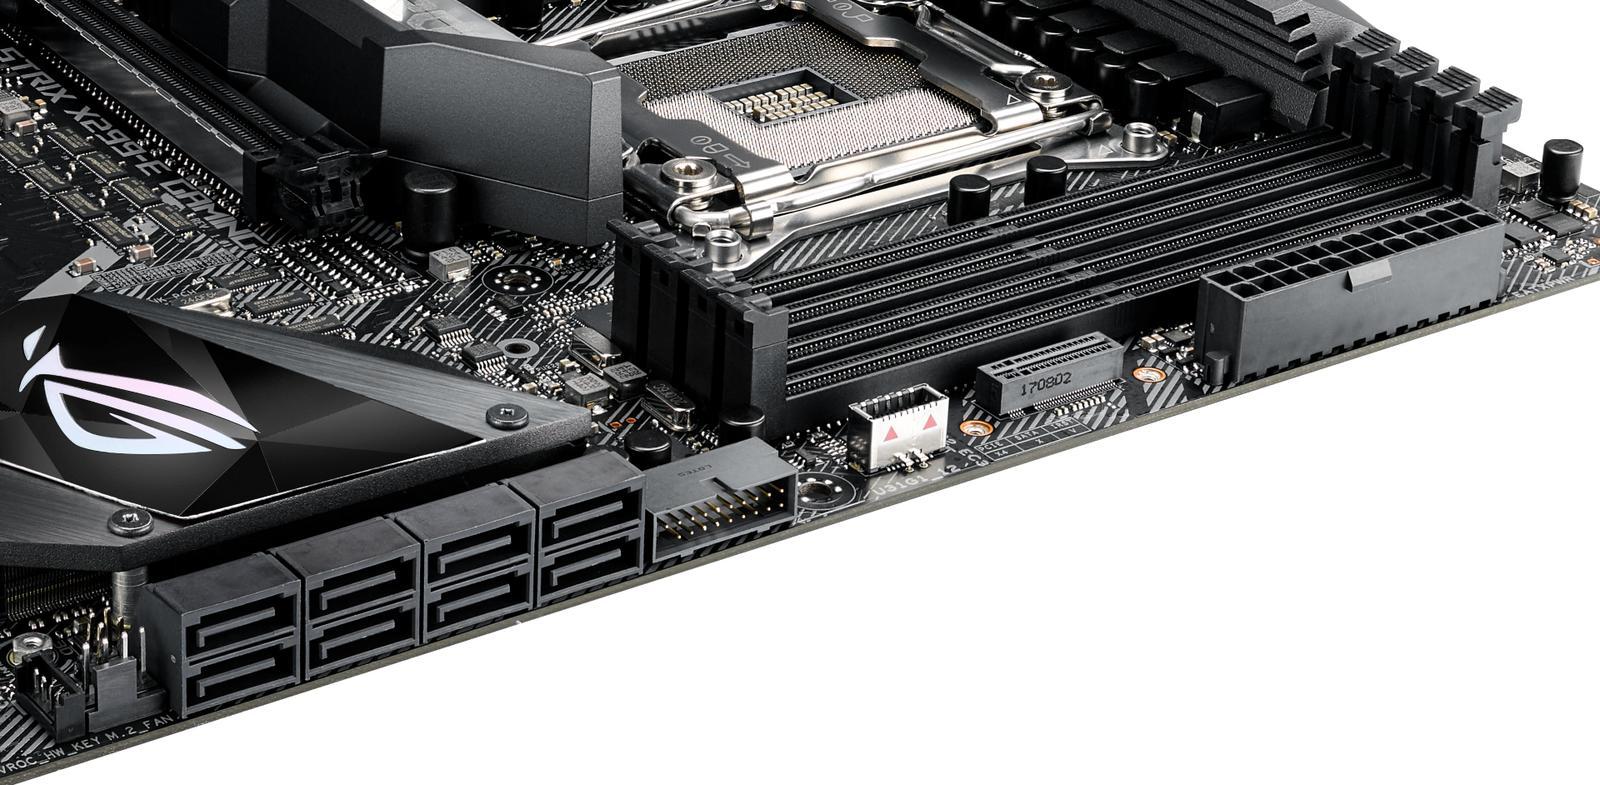 Asus ROG STRIX X299-E GAMING ATX LGA 2066